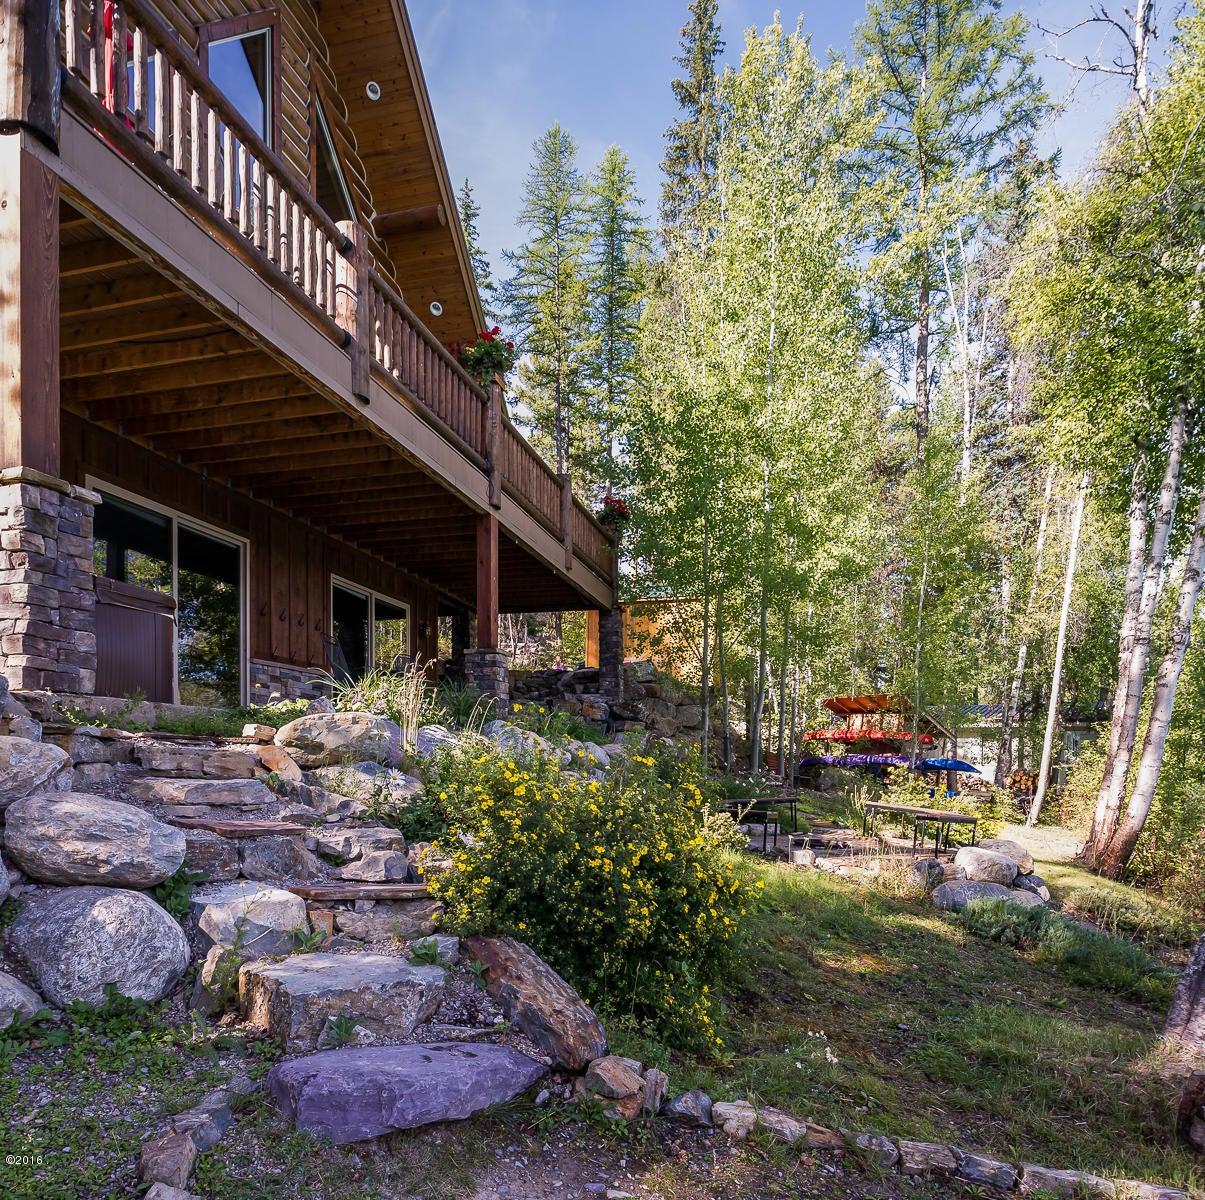 Additional photo for property listing at 4331 Ashley Lake Road  Kalispell, Montana 59901 United States